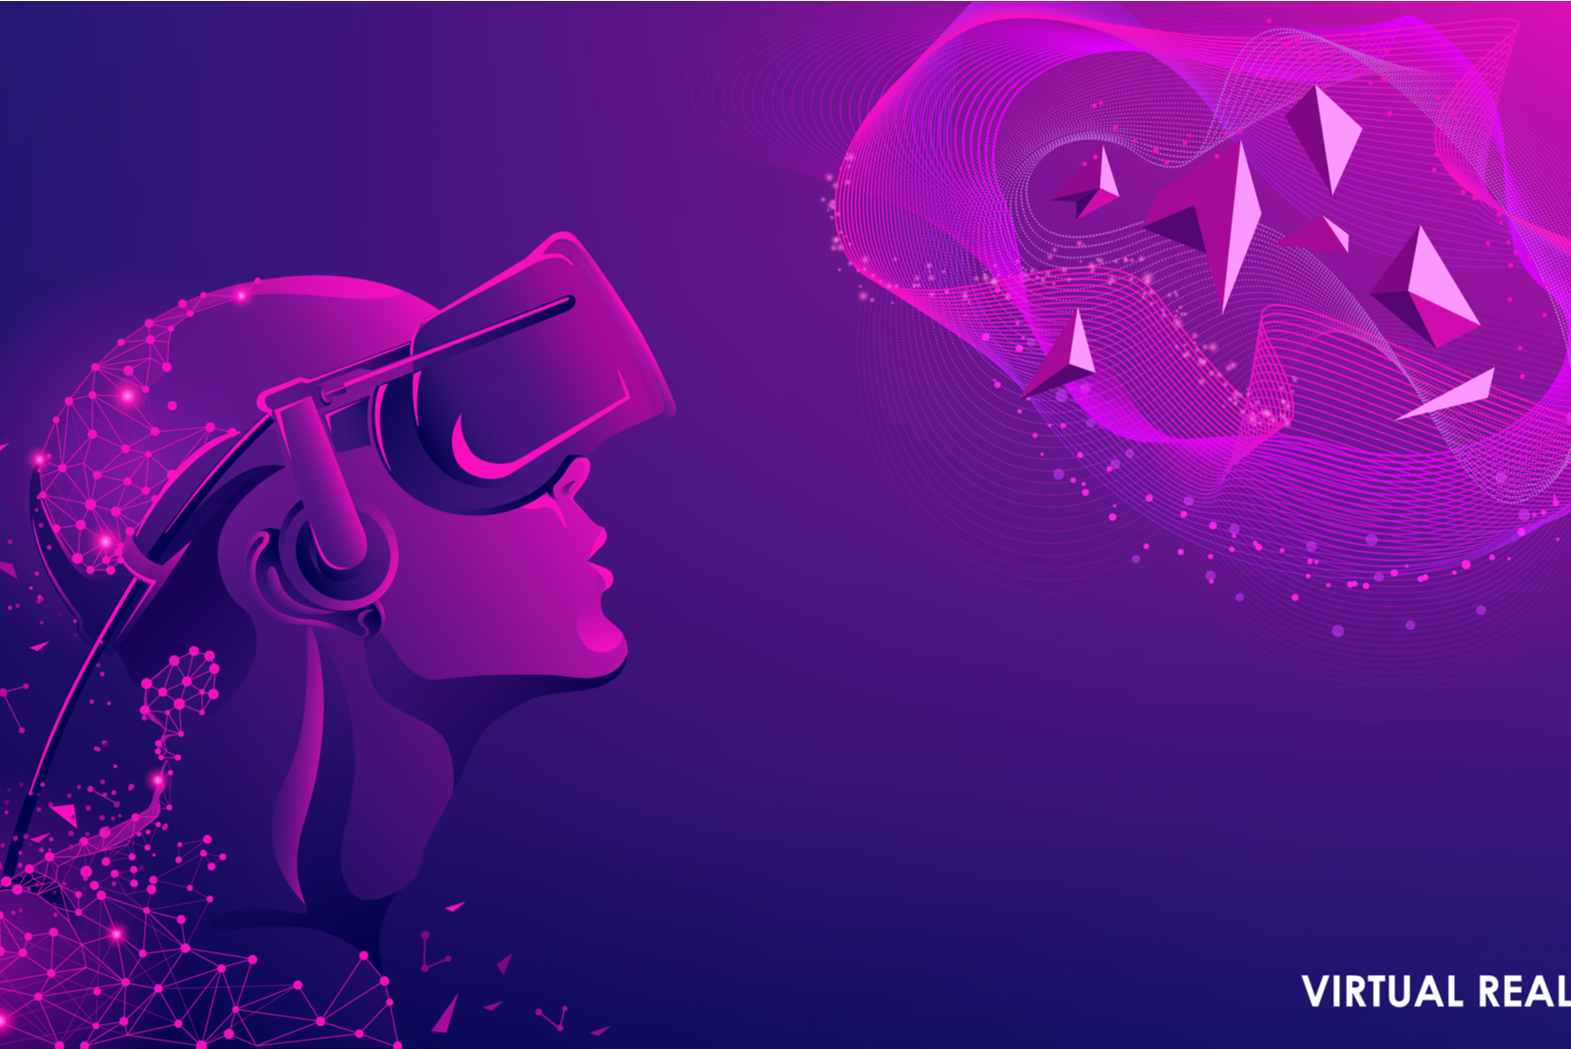 VR startup Mesmerise snaps up ex-Microsoft VP to advisory board